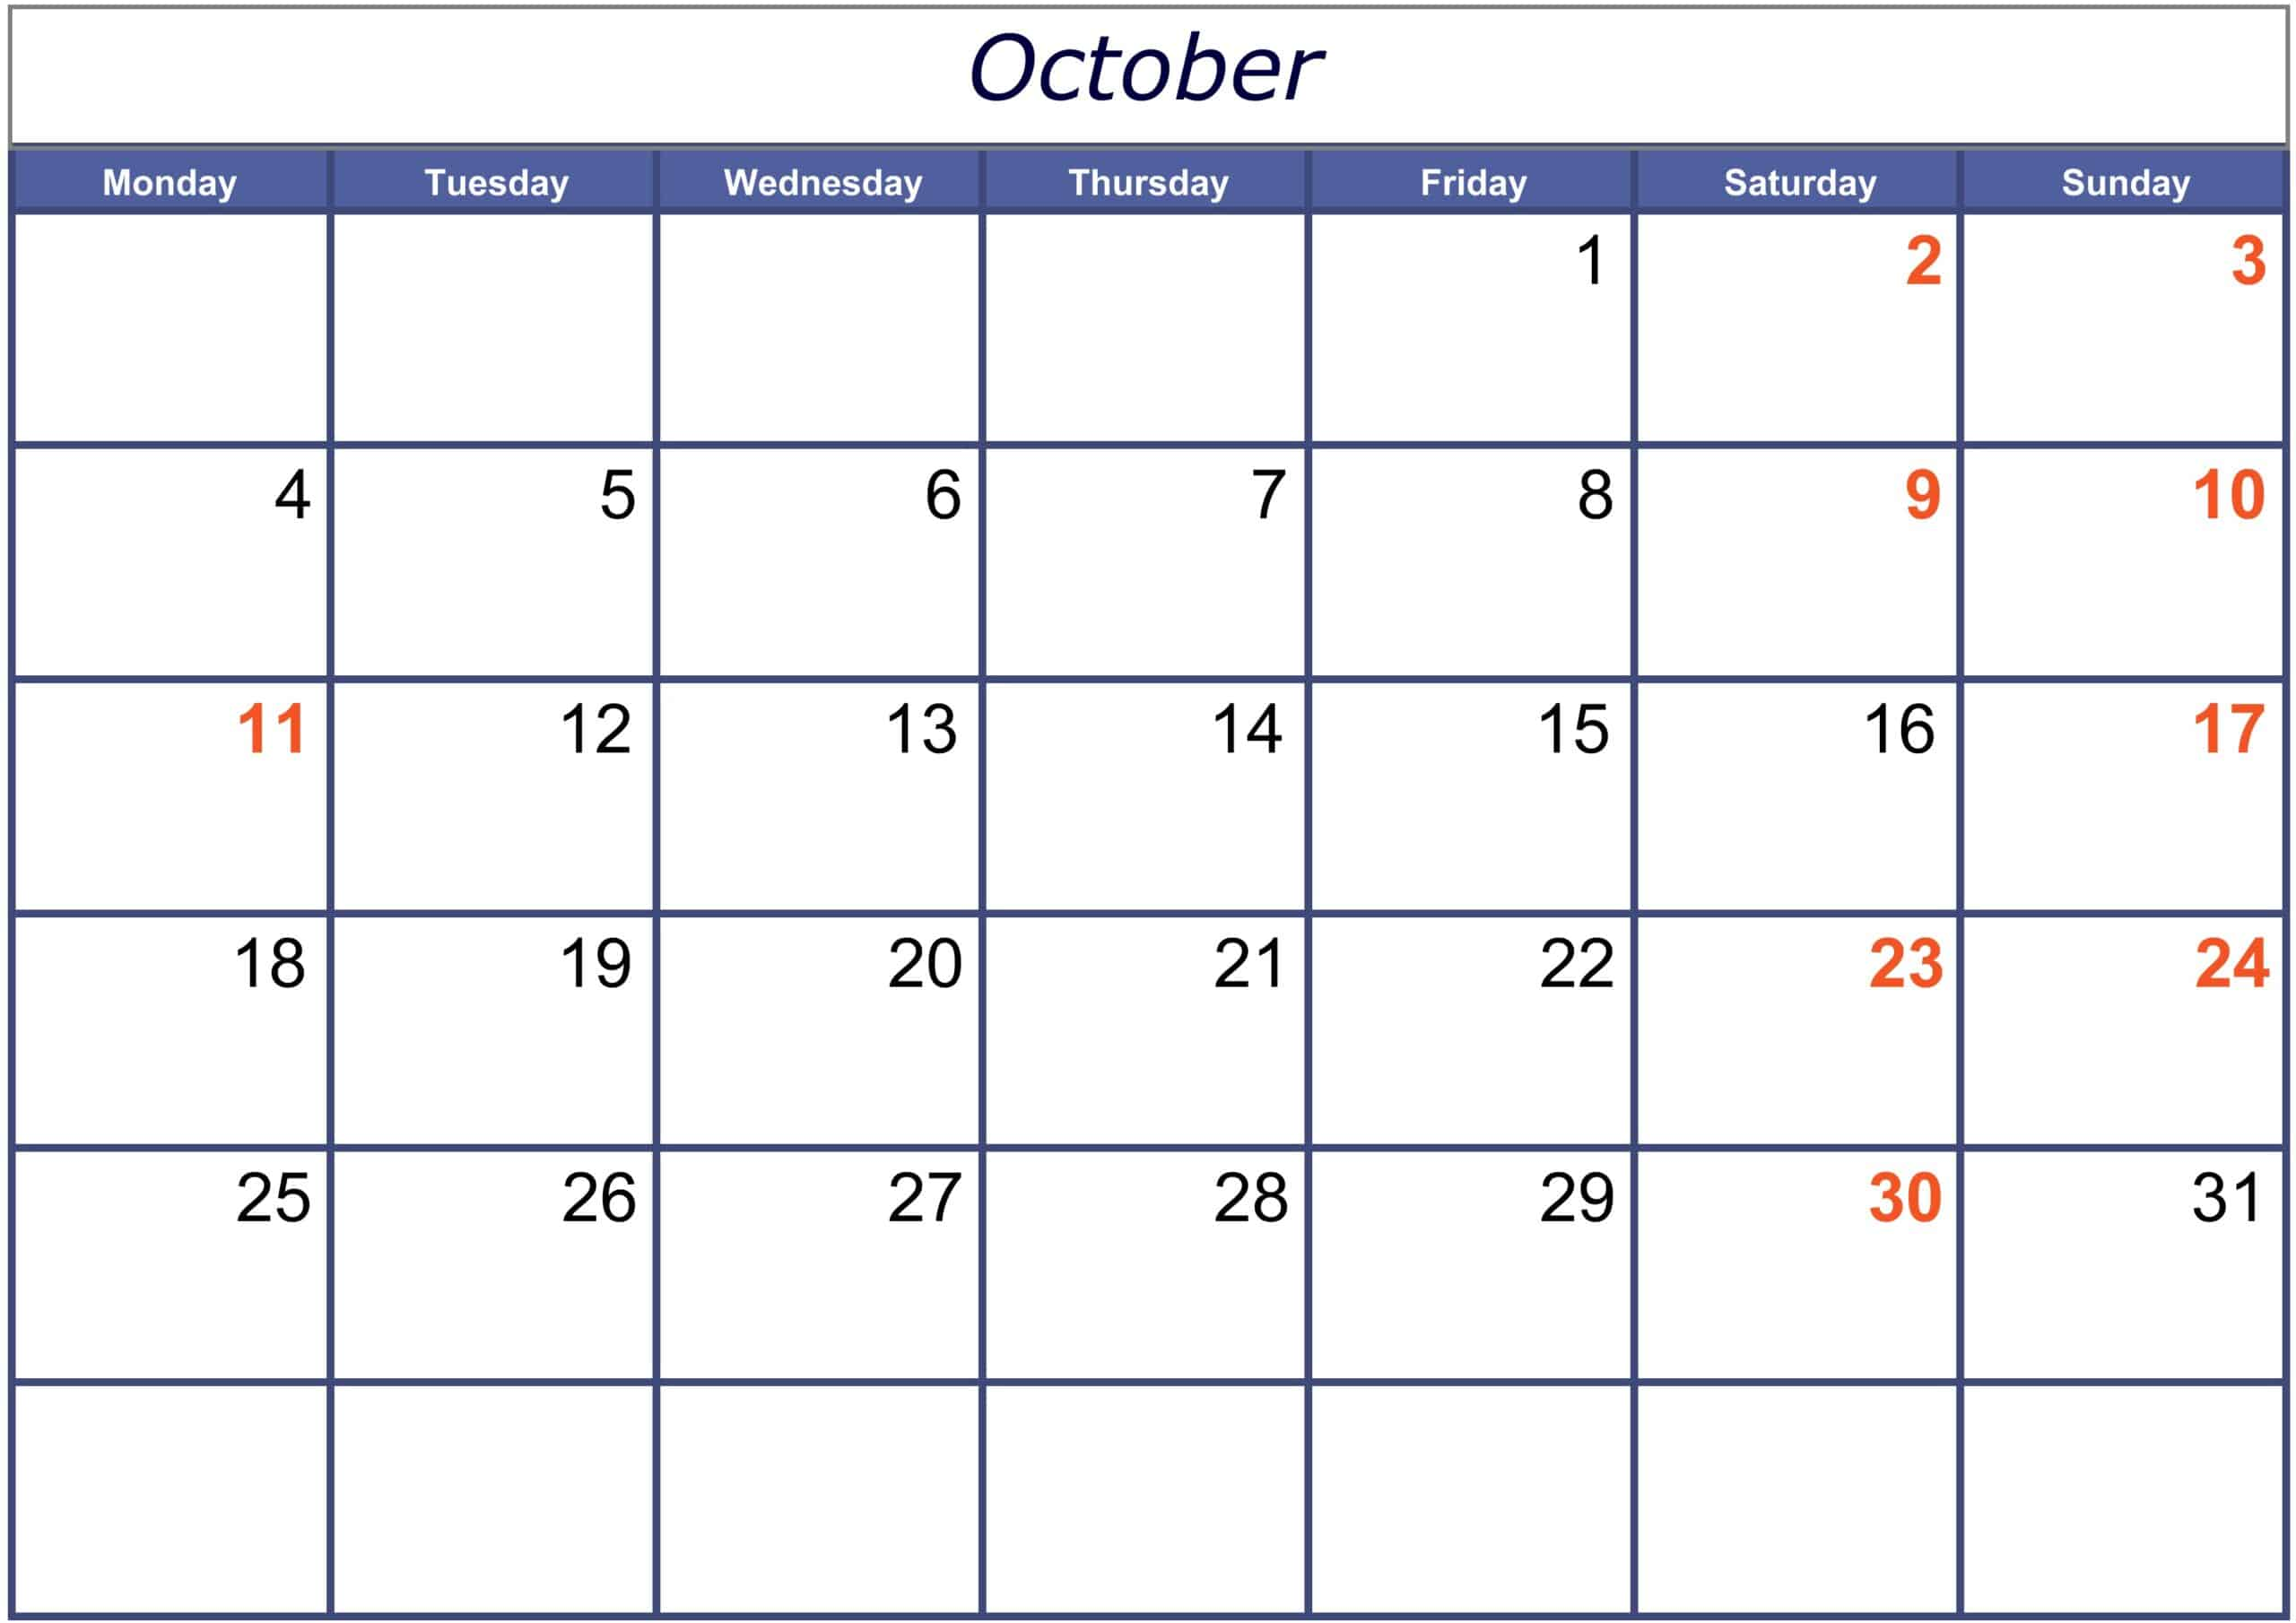 Excel October 2021 Calendar